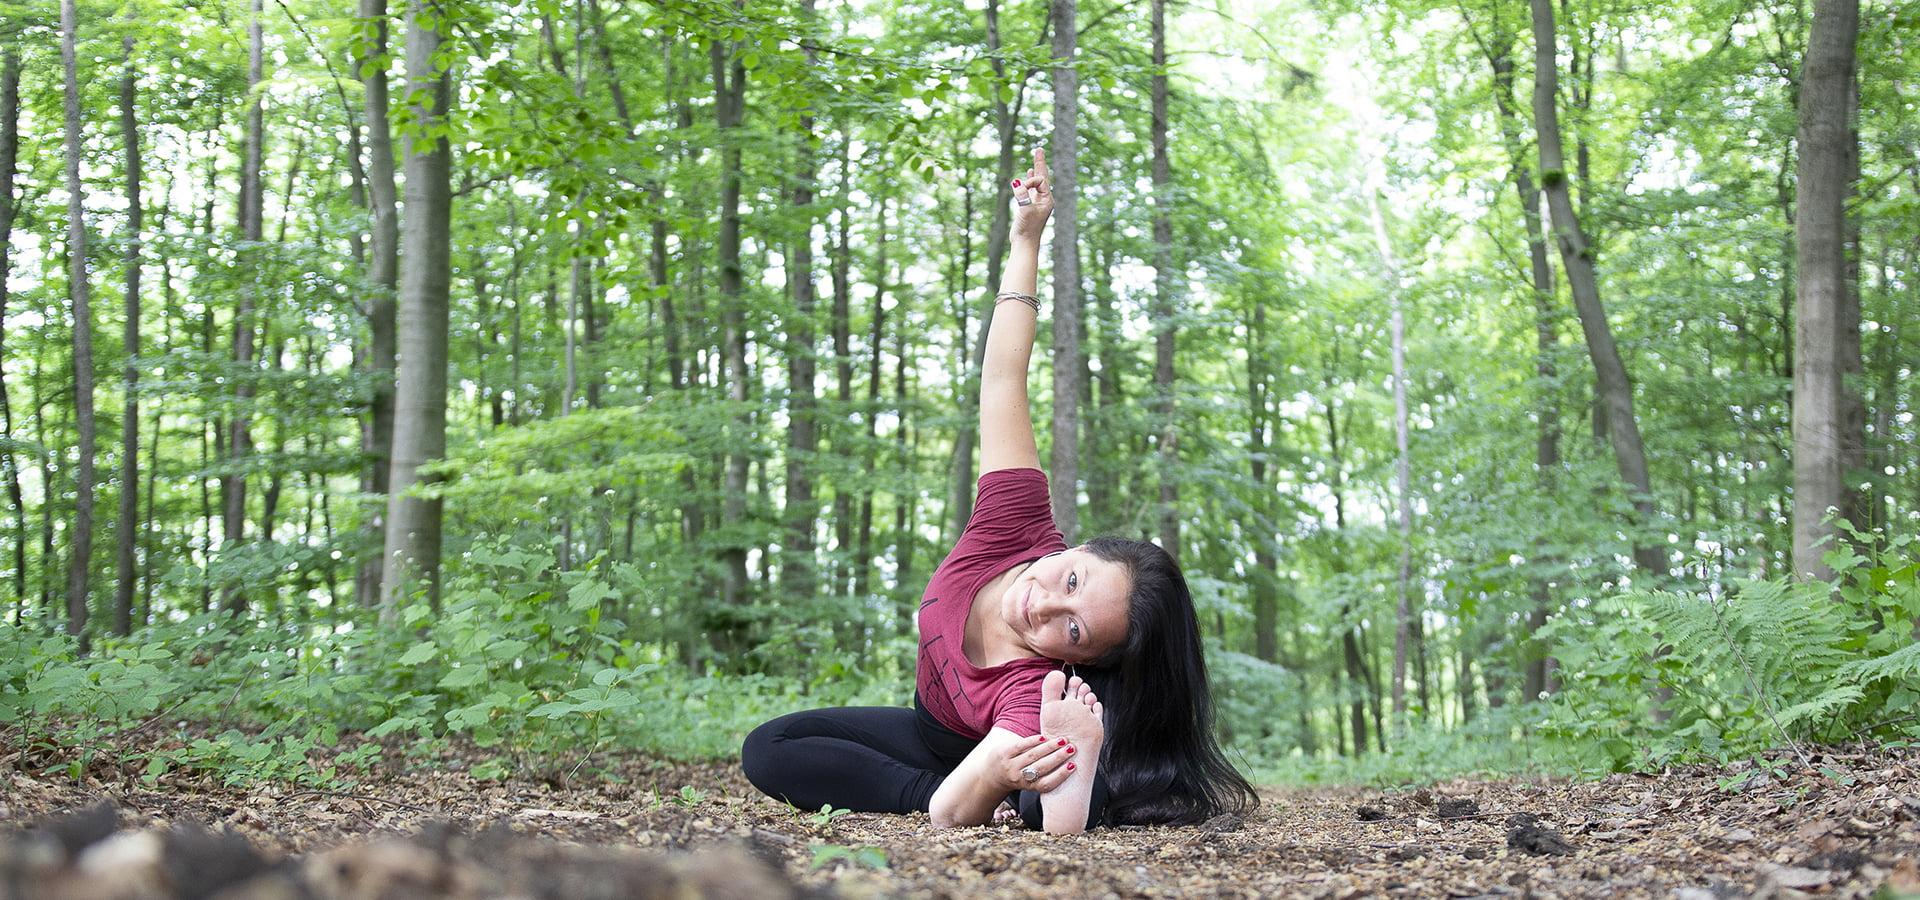 evia yoga-pose solingen outdoor wald janu shirshasana variante